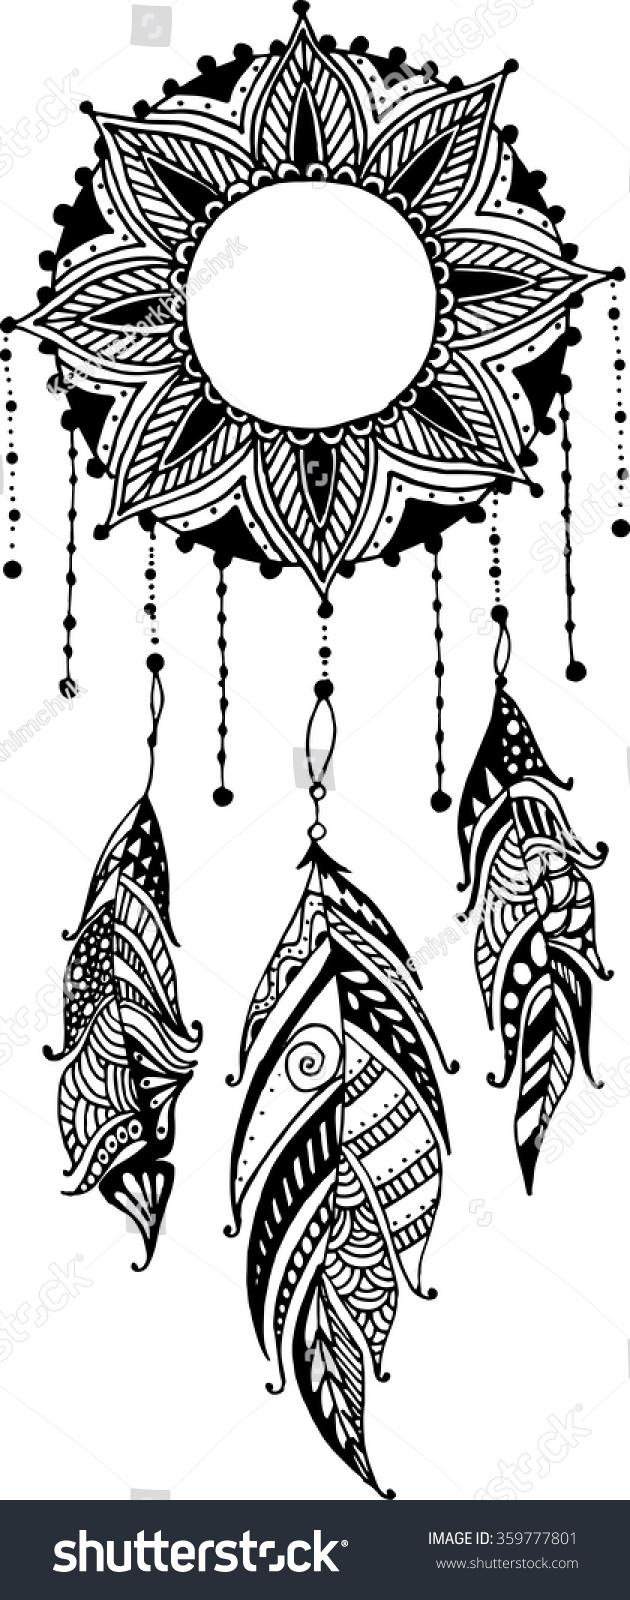 Handdrawn Sun Mandala Dreamcatcher Feathers Ethnic Stock